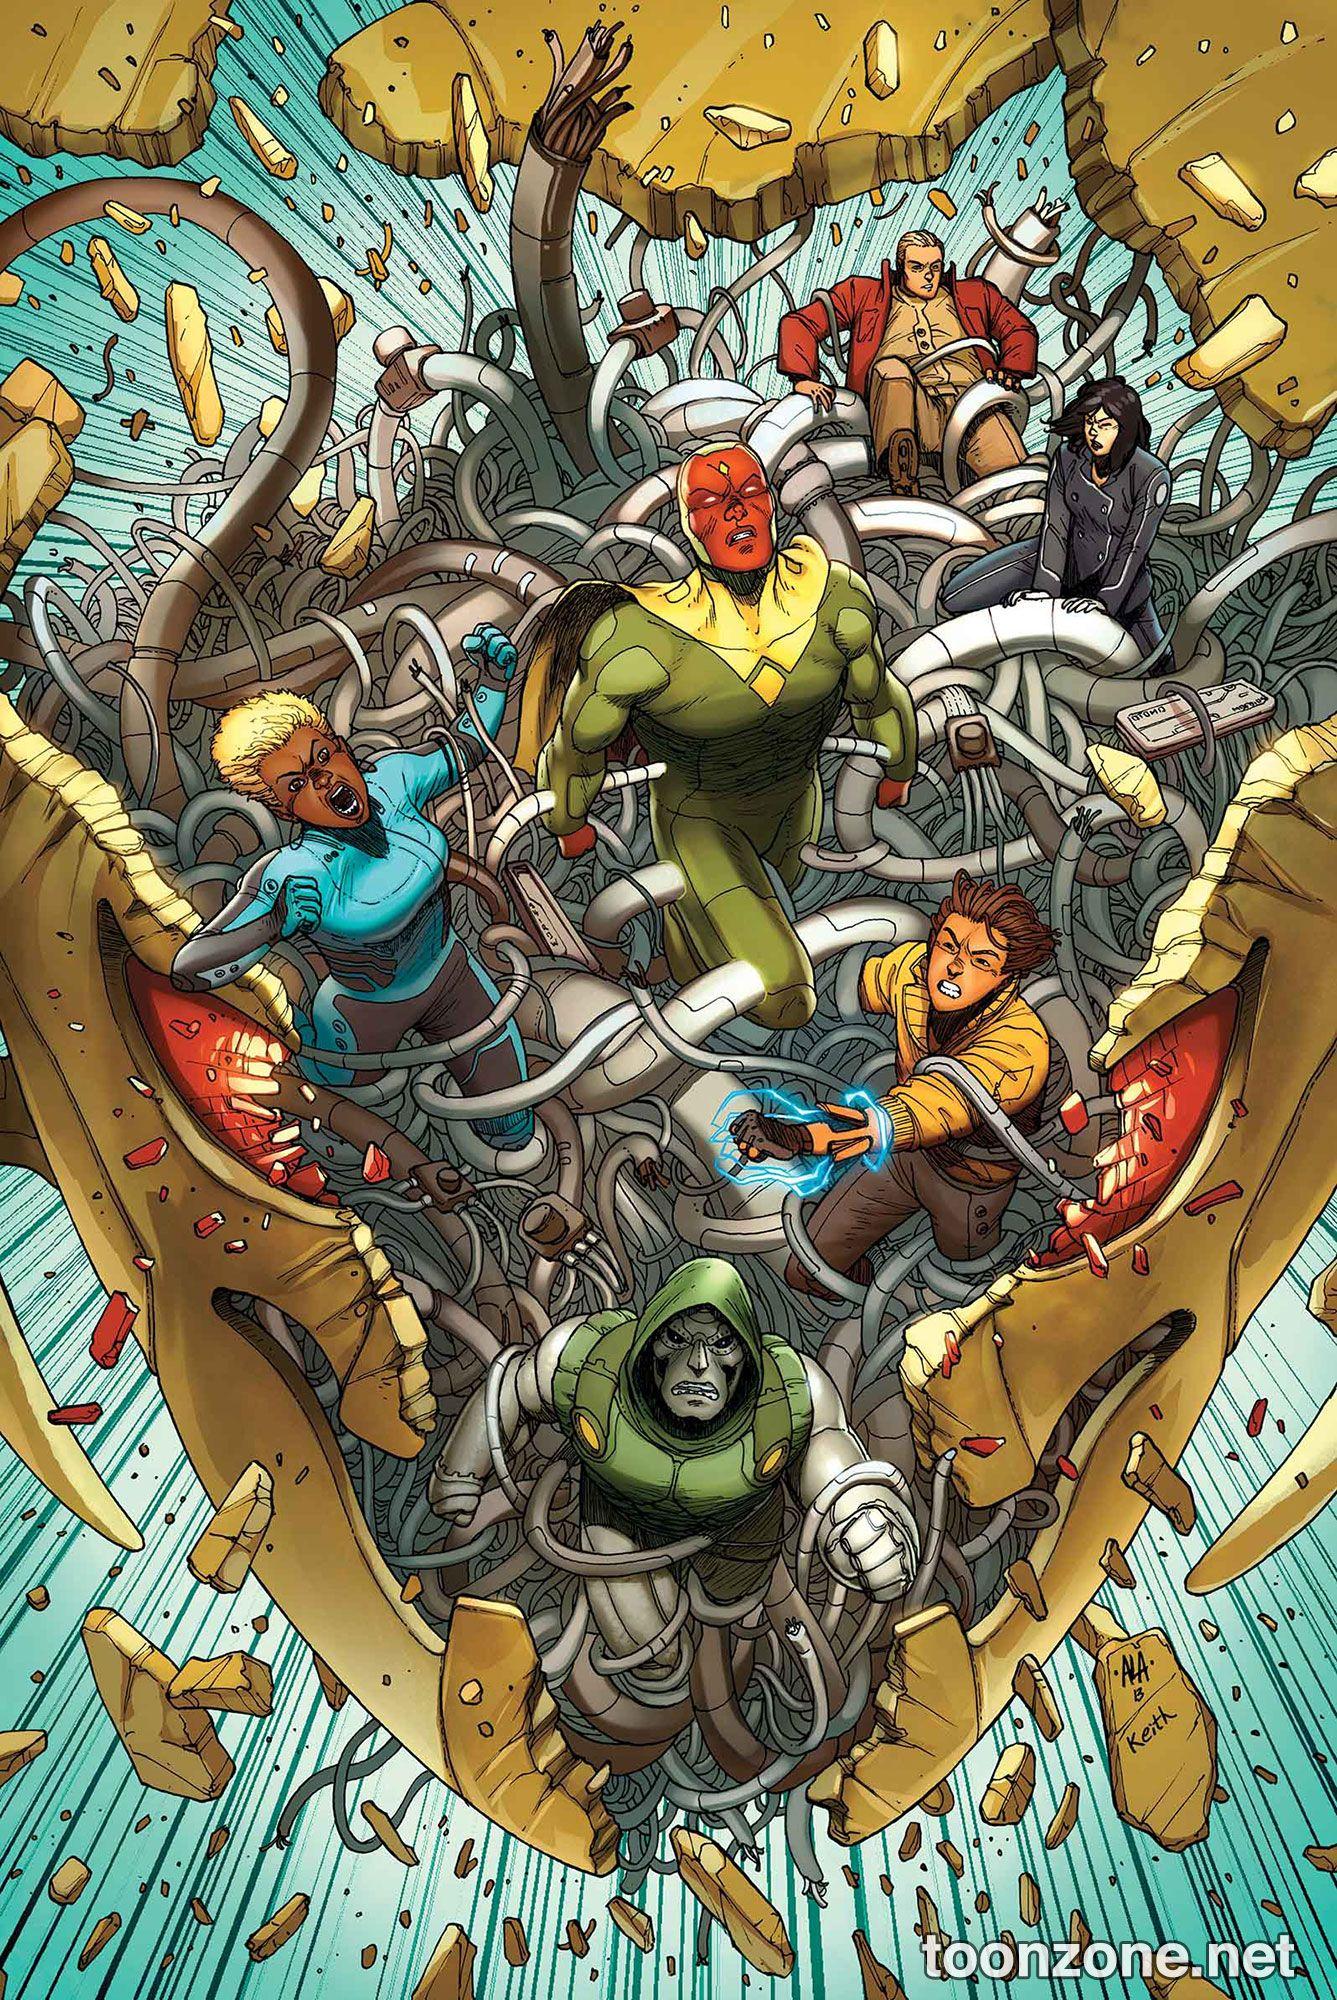 AVENGERS A.I. #1 (Variant Cover)